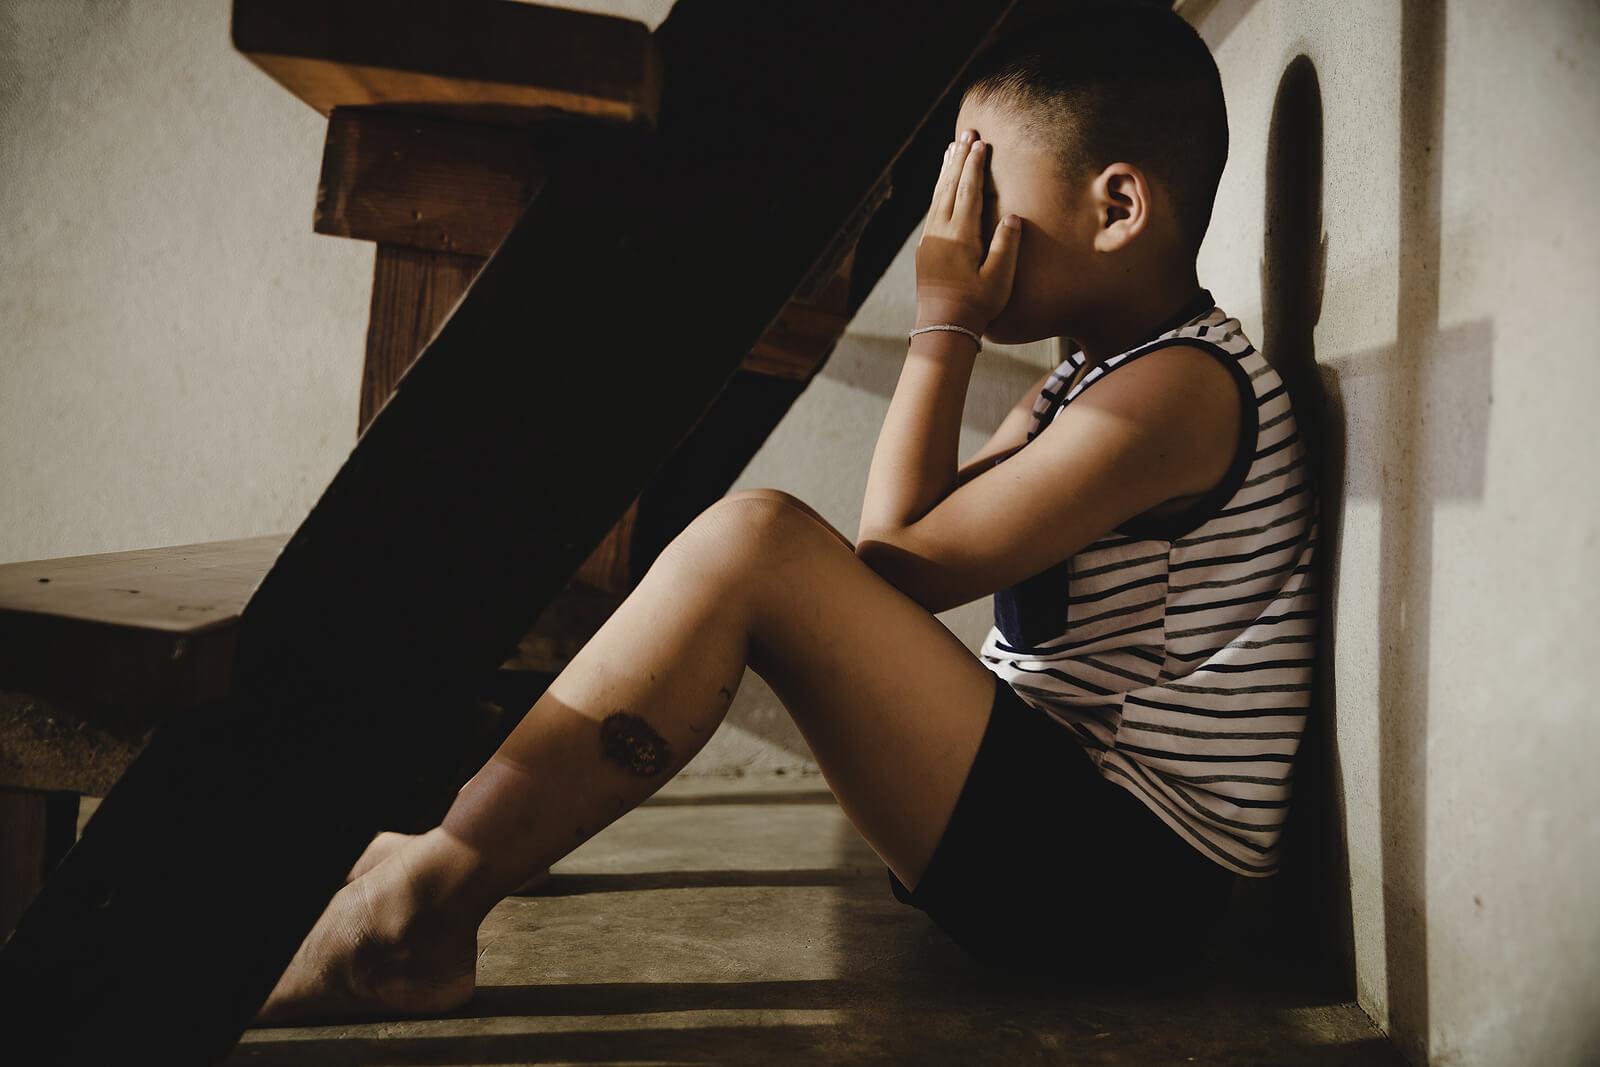 Niño triste debido al abandono paterno.